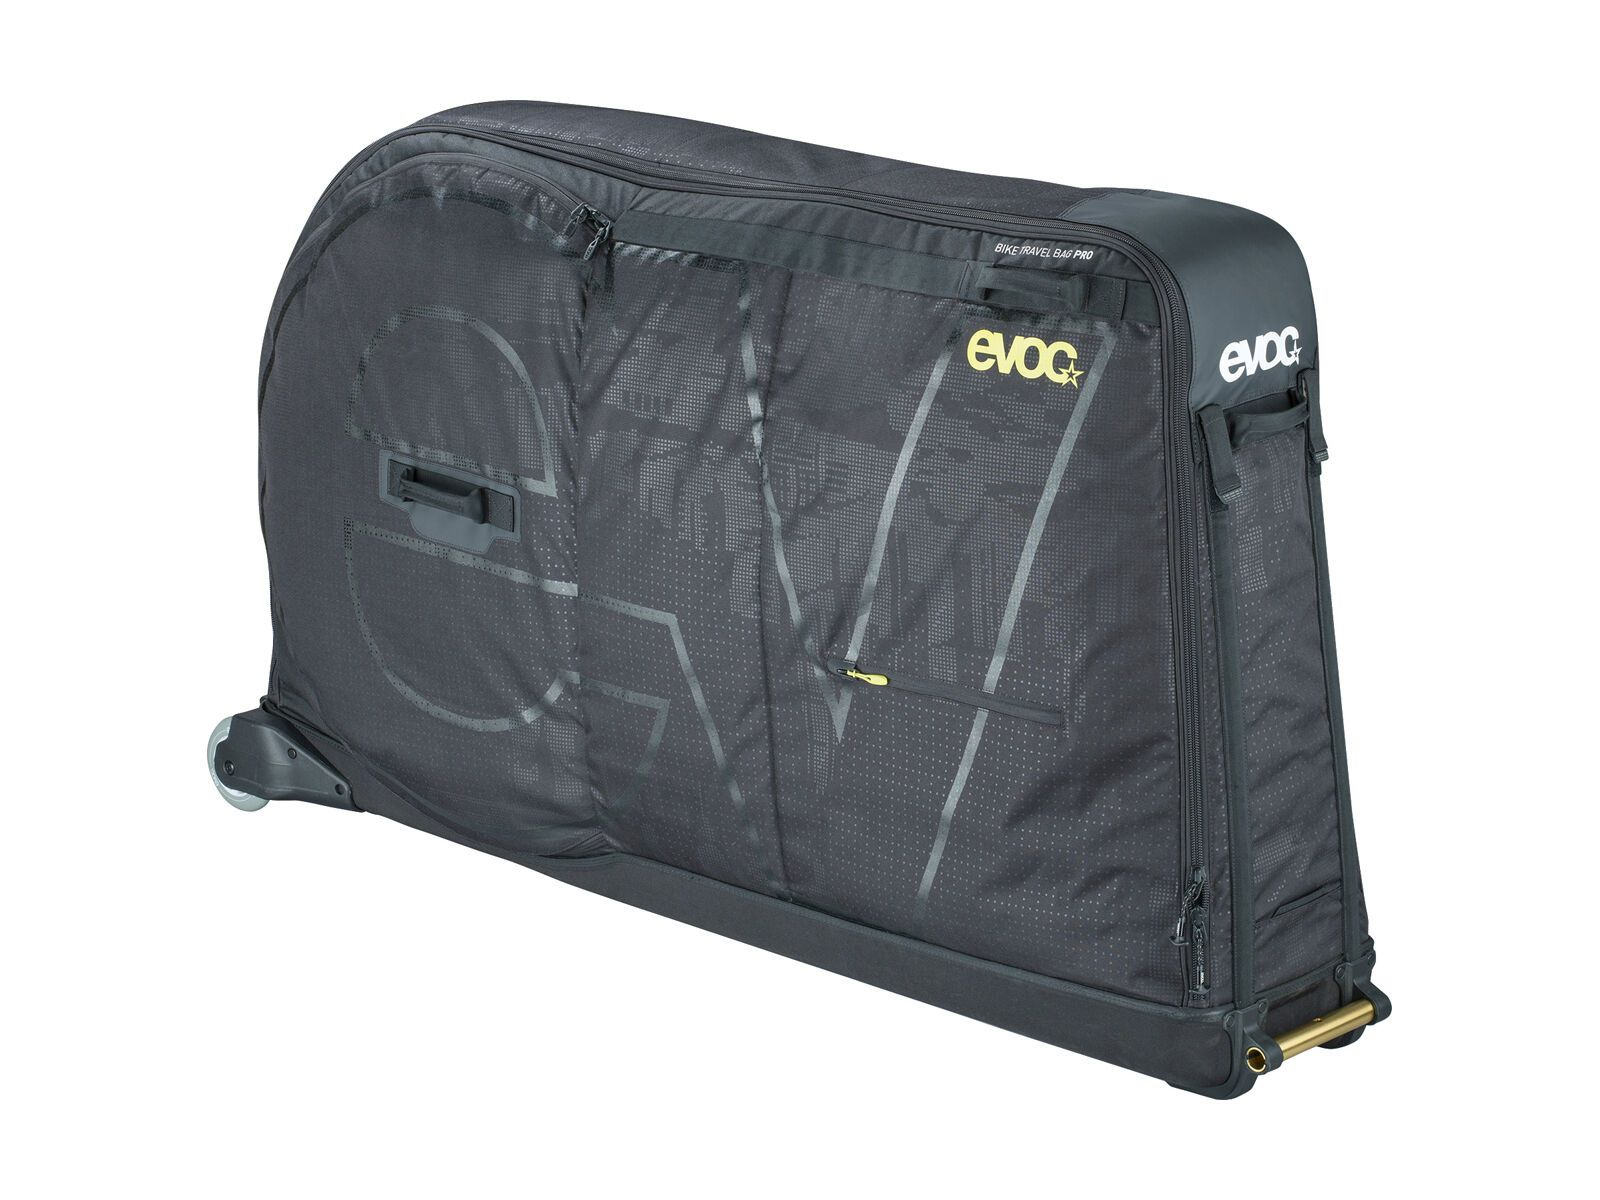 Evoc Bike Travel Bag 280l, black - Fahrradtransporttasche 450721017